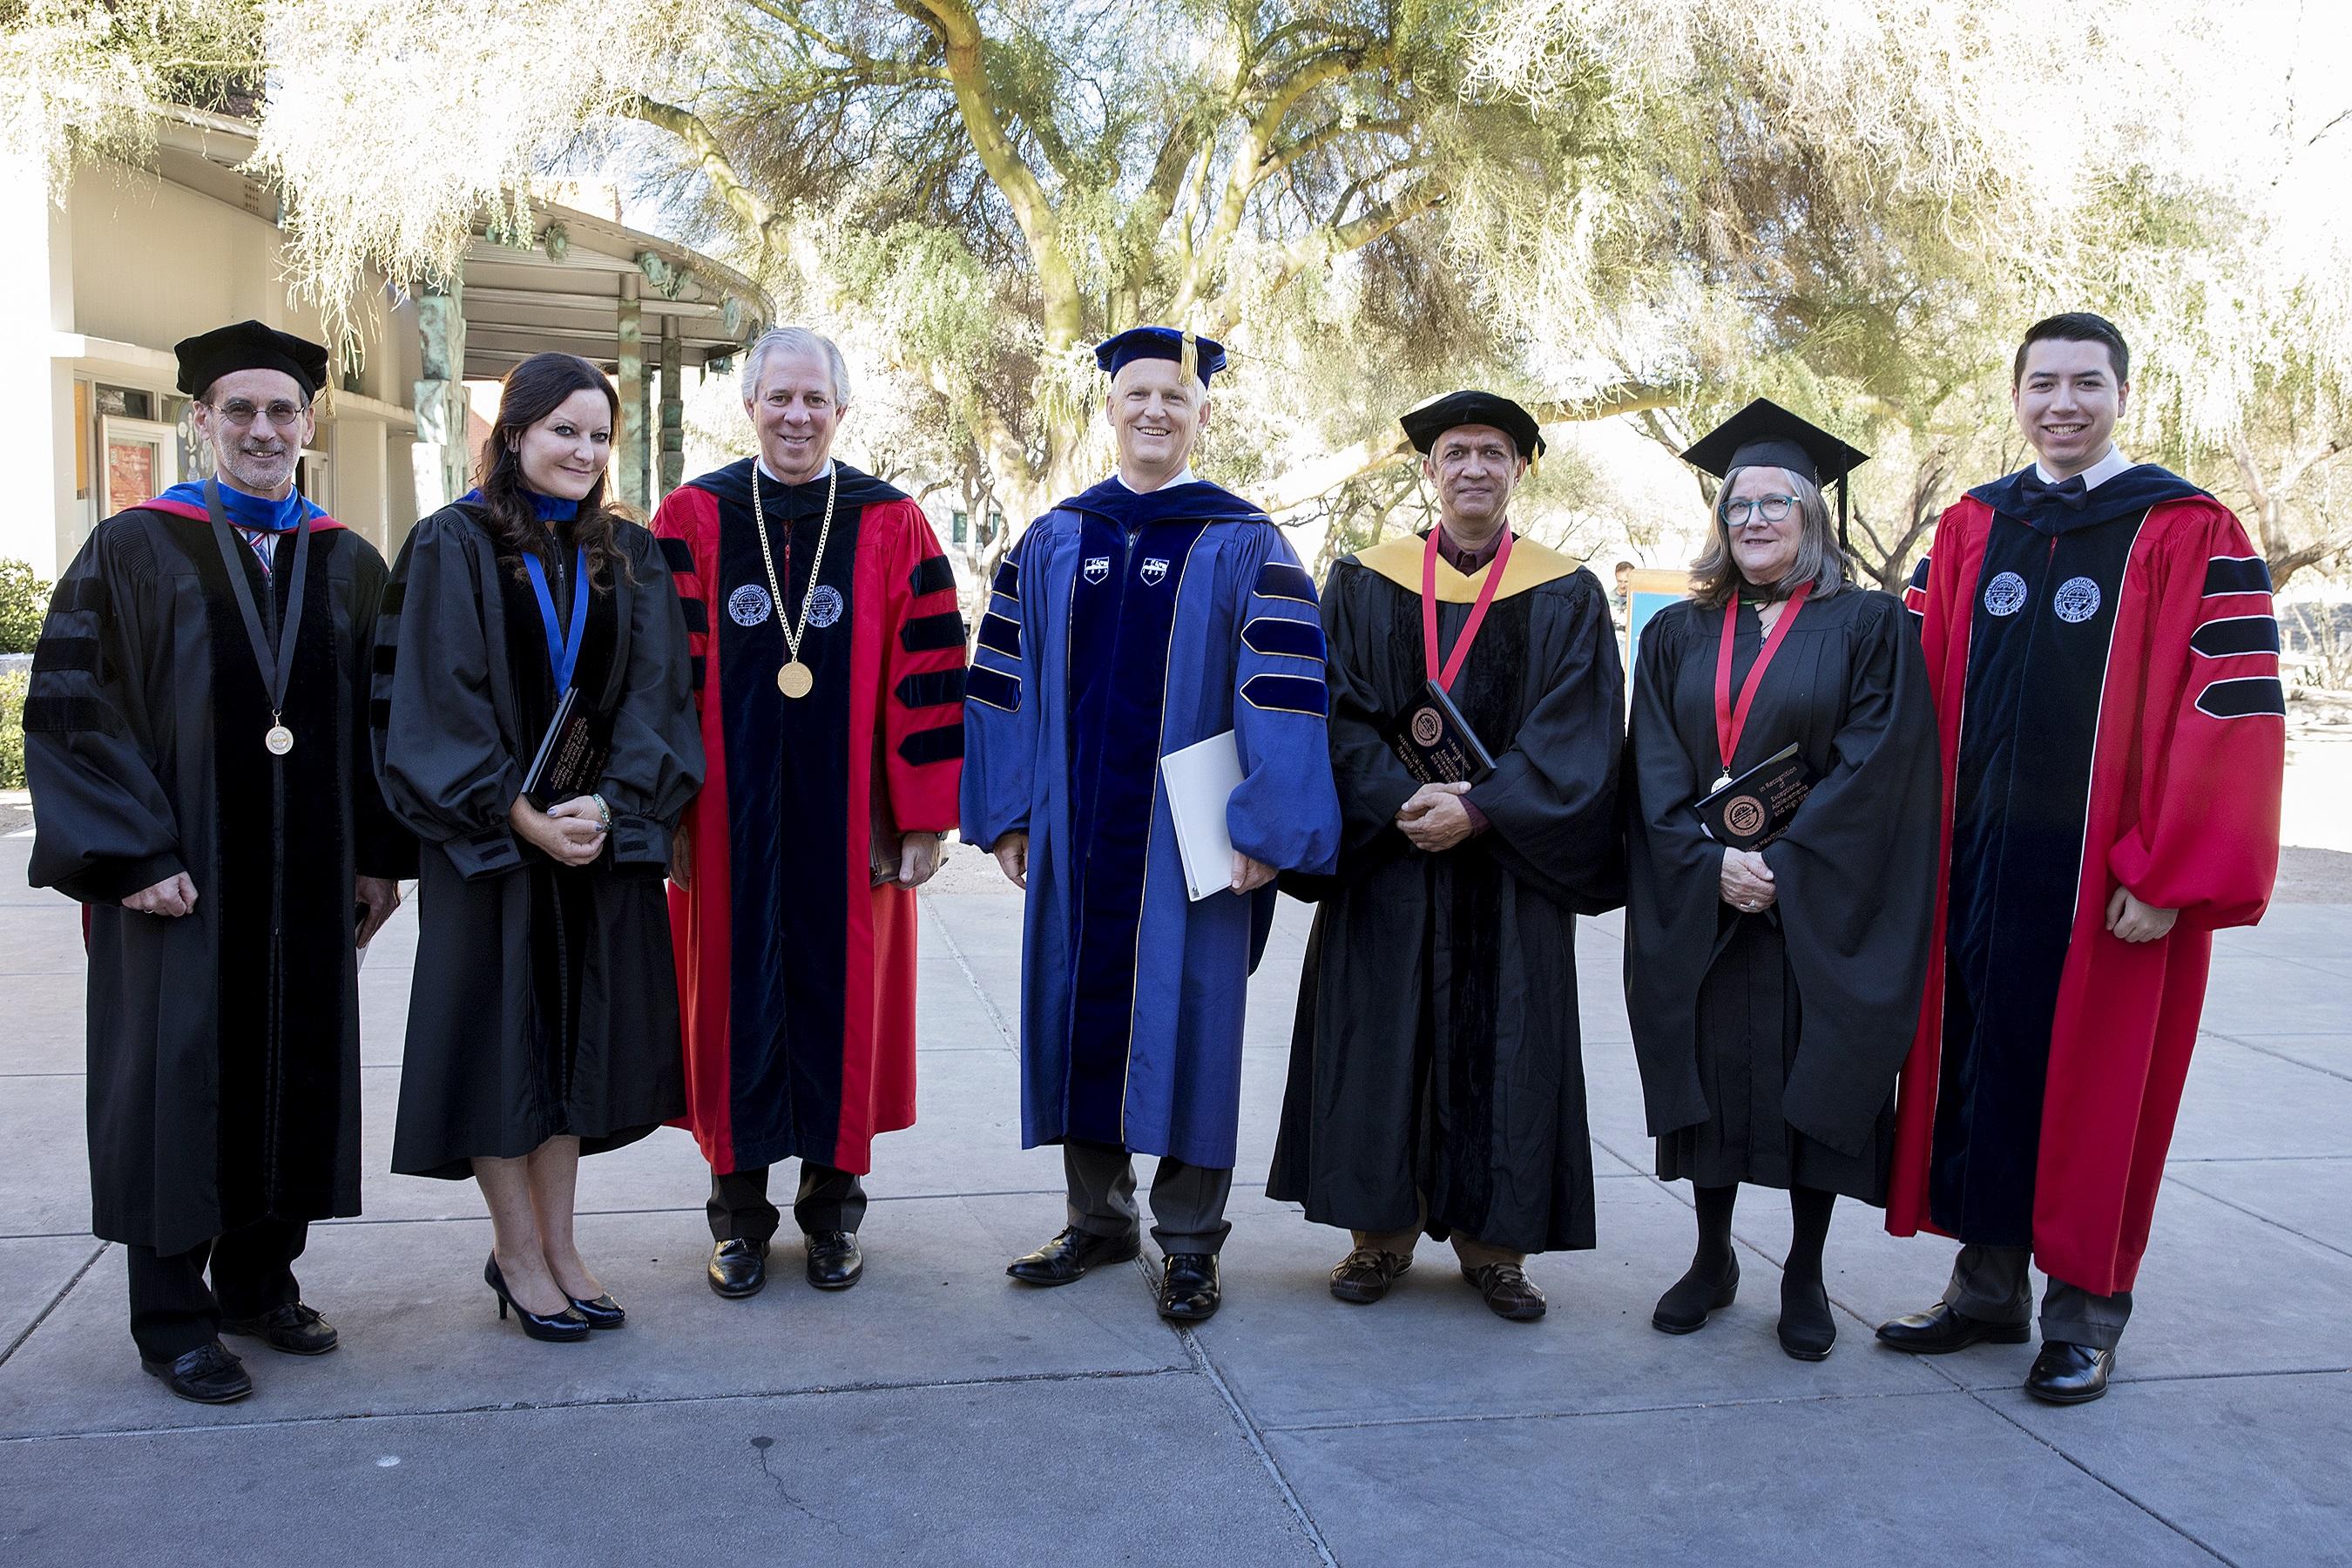 2017 Regents Professors group photo